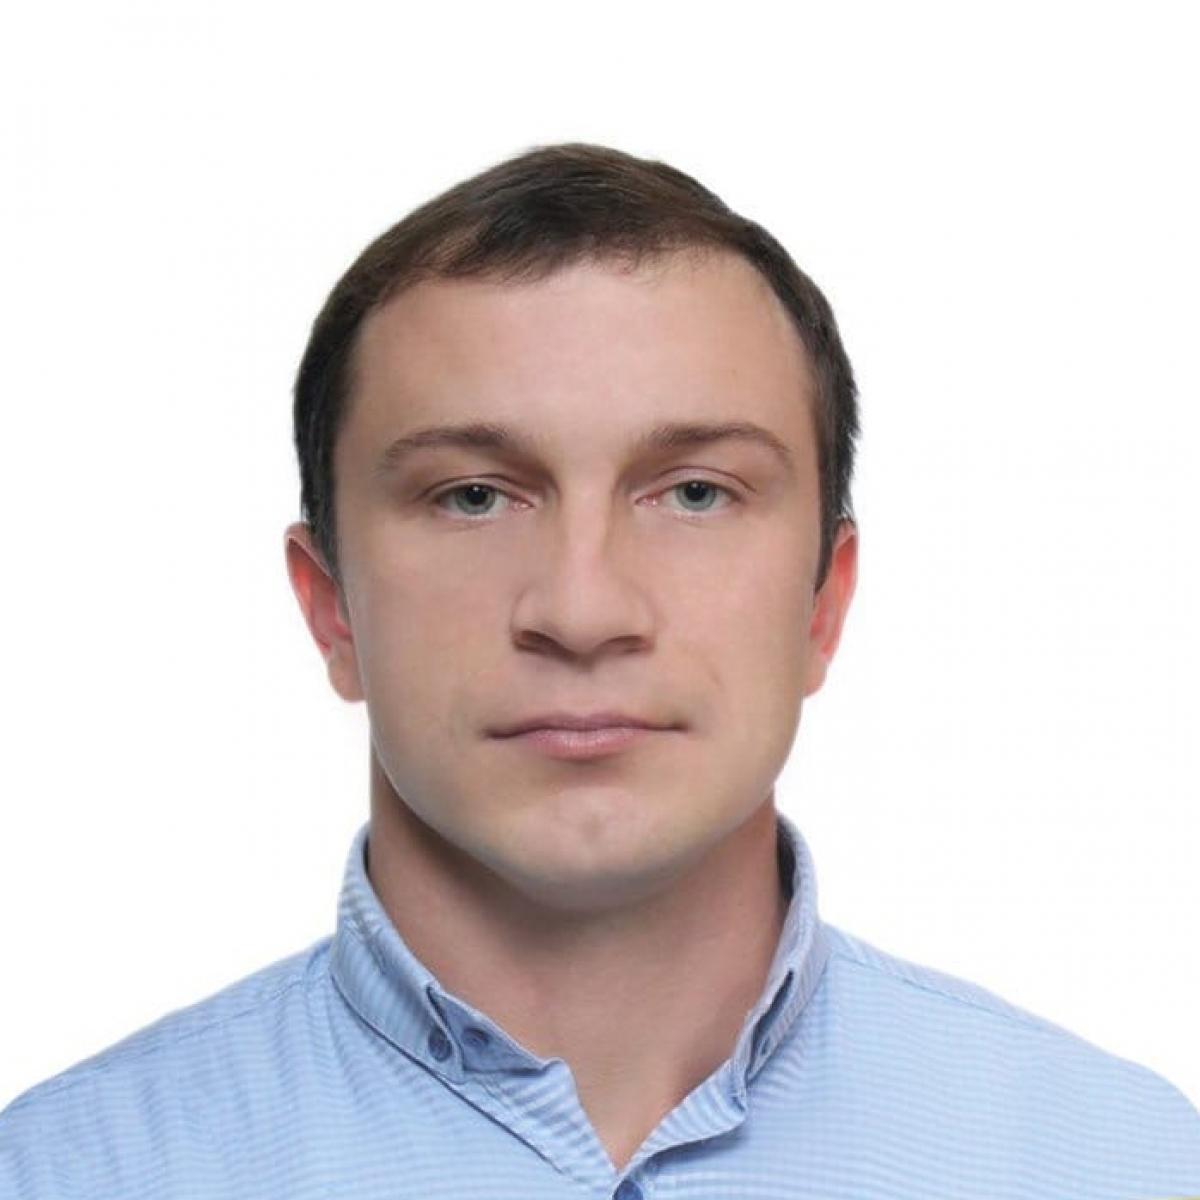 Галенко Максим Петрович